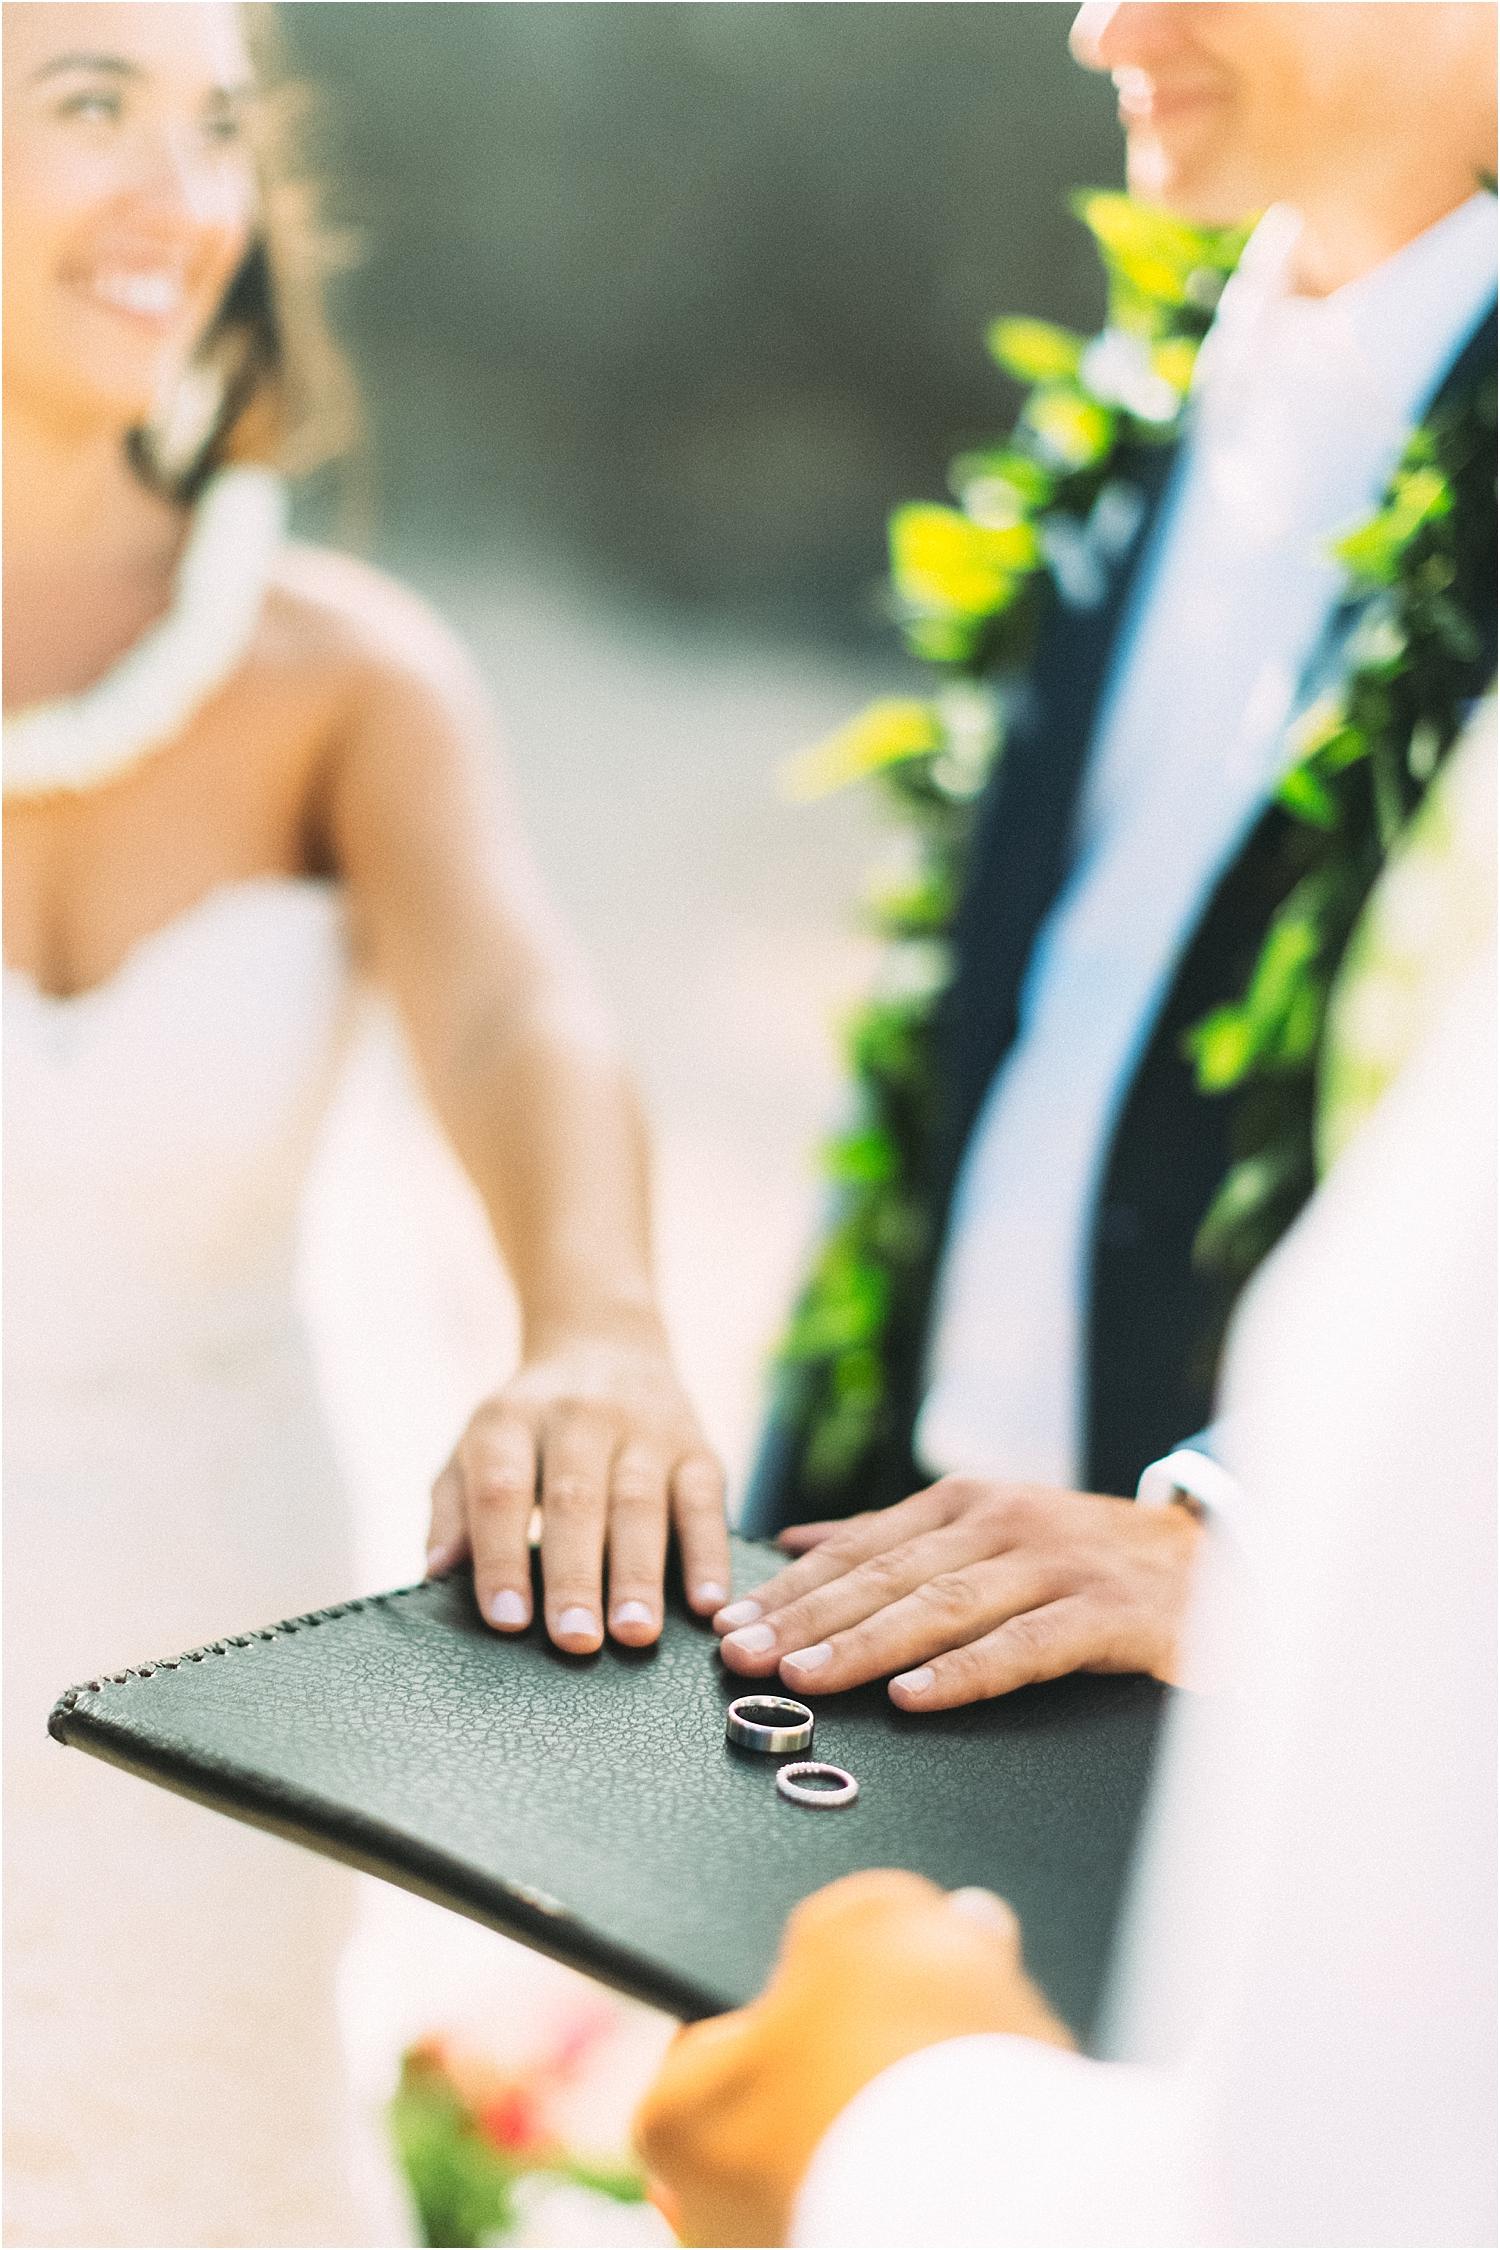 angie-diaz-photography-maui-wedding-ironwoods-beach_0026.jpg